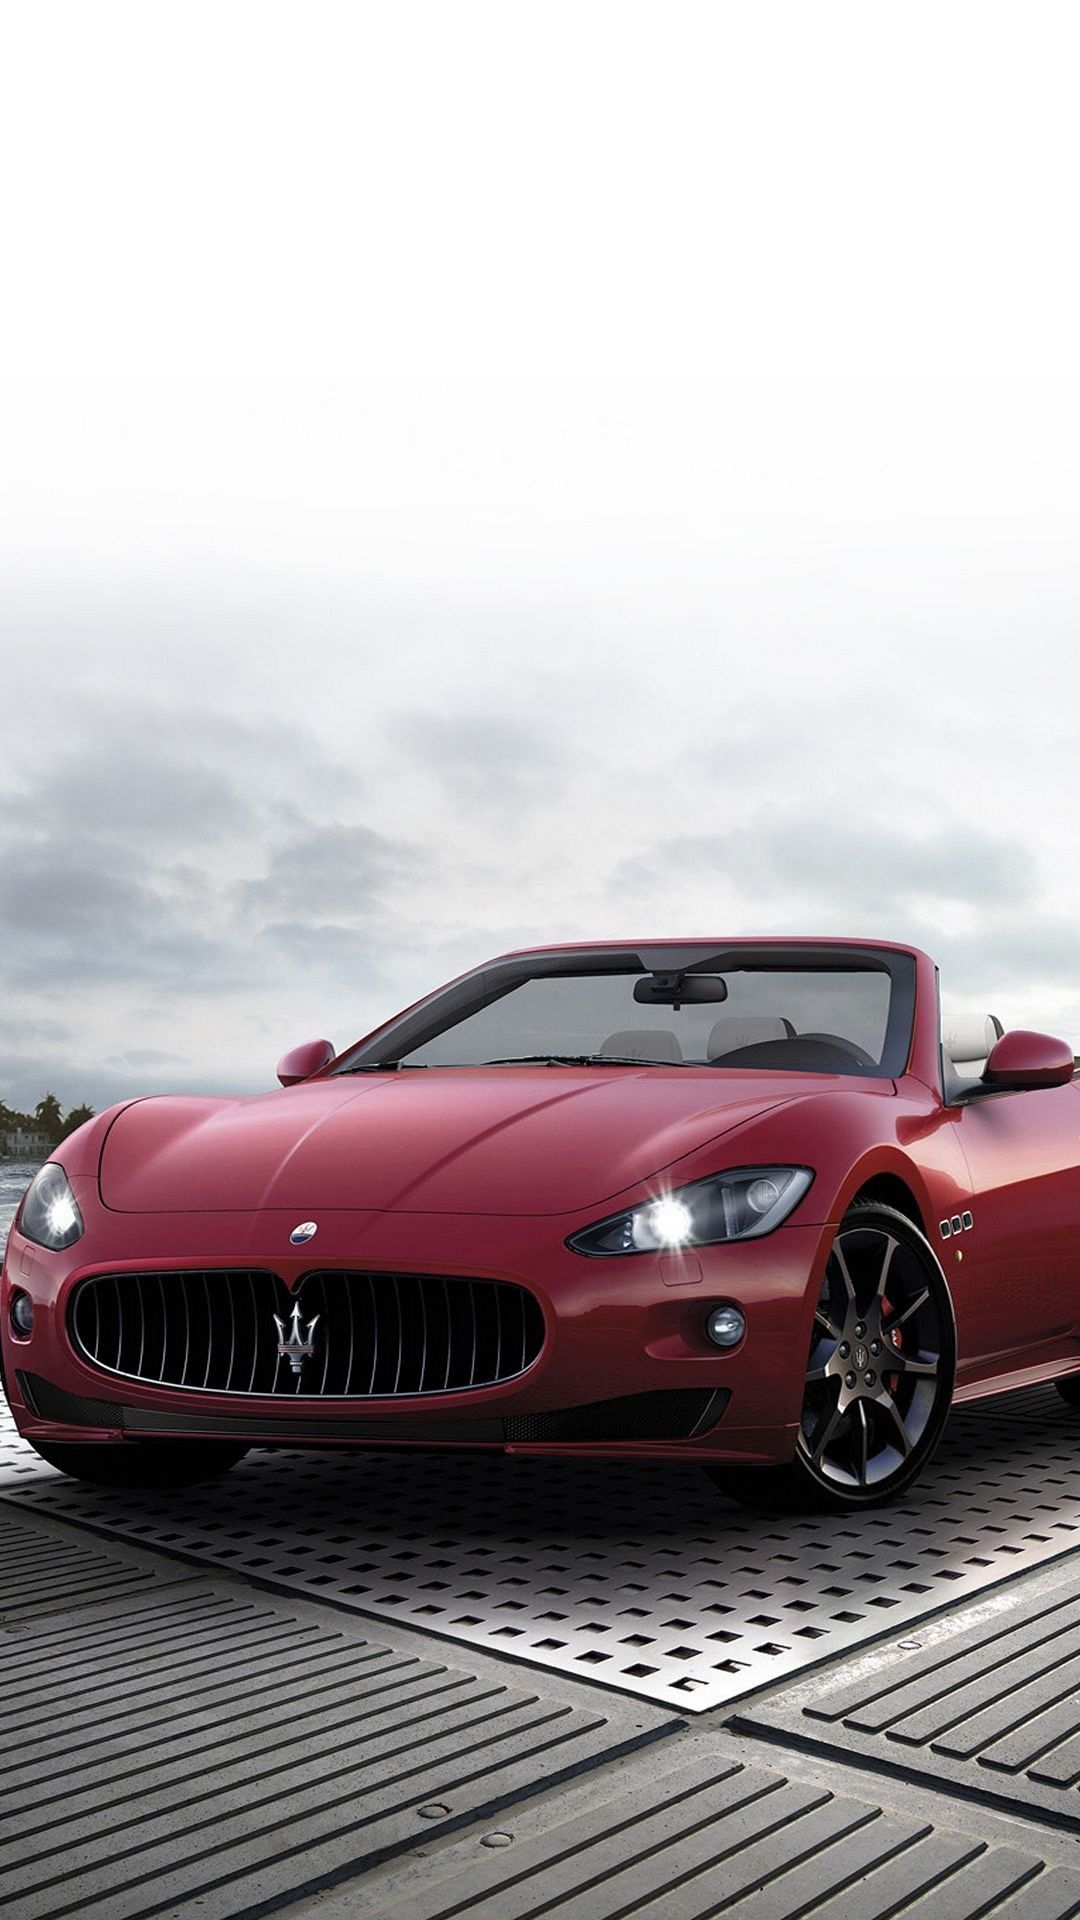 Pin By Saly On Cars In 2020 Maserati Granturismo Maserati Car Wallpapers